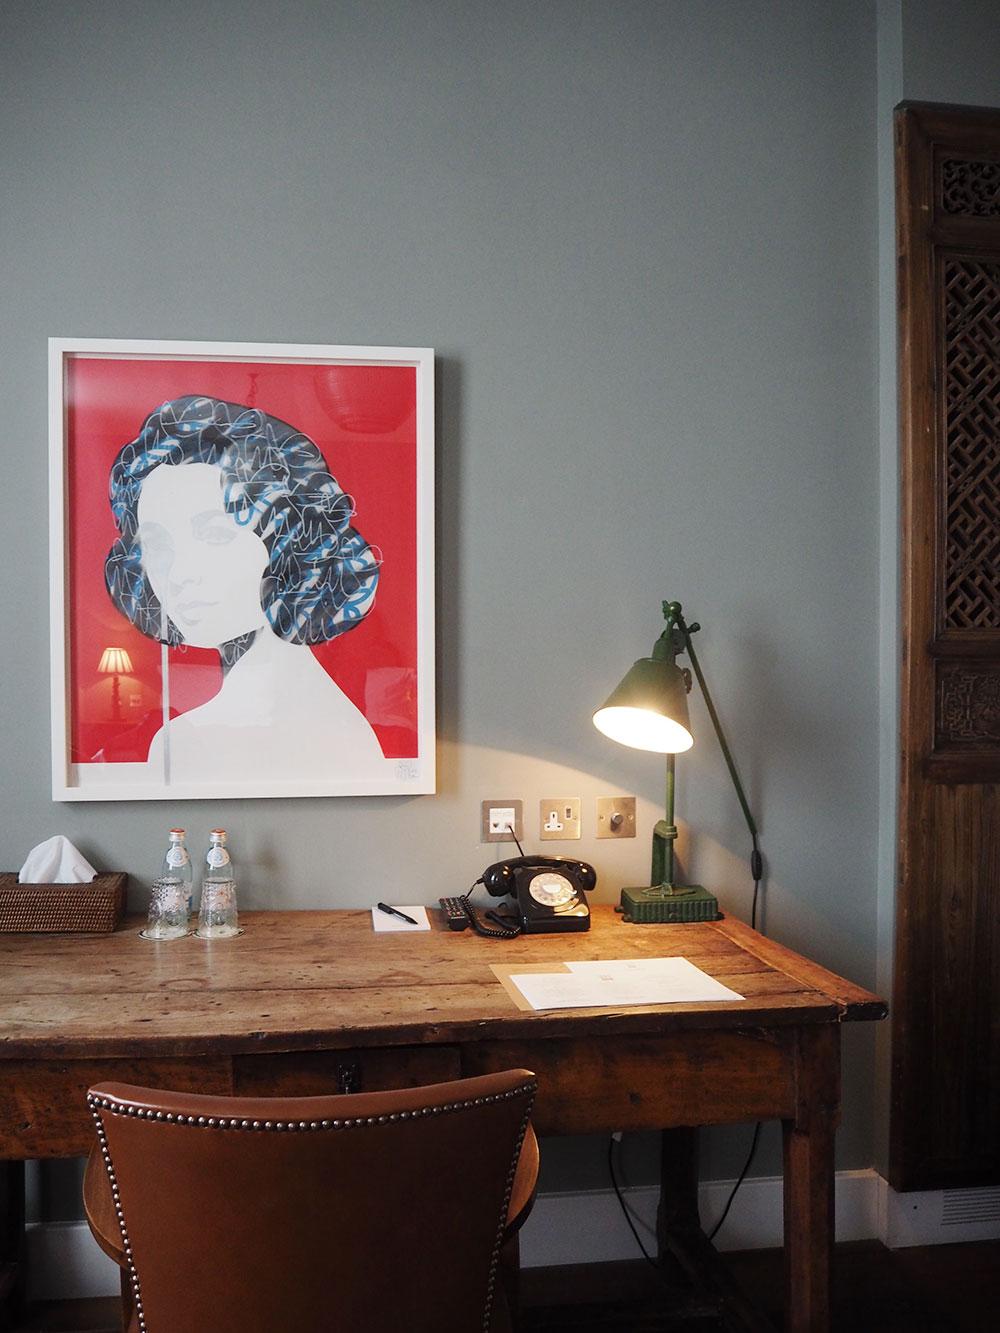 RosyCheeks-Hotel-Artist-Residence-London-desk